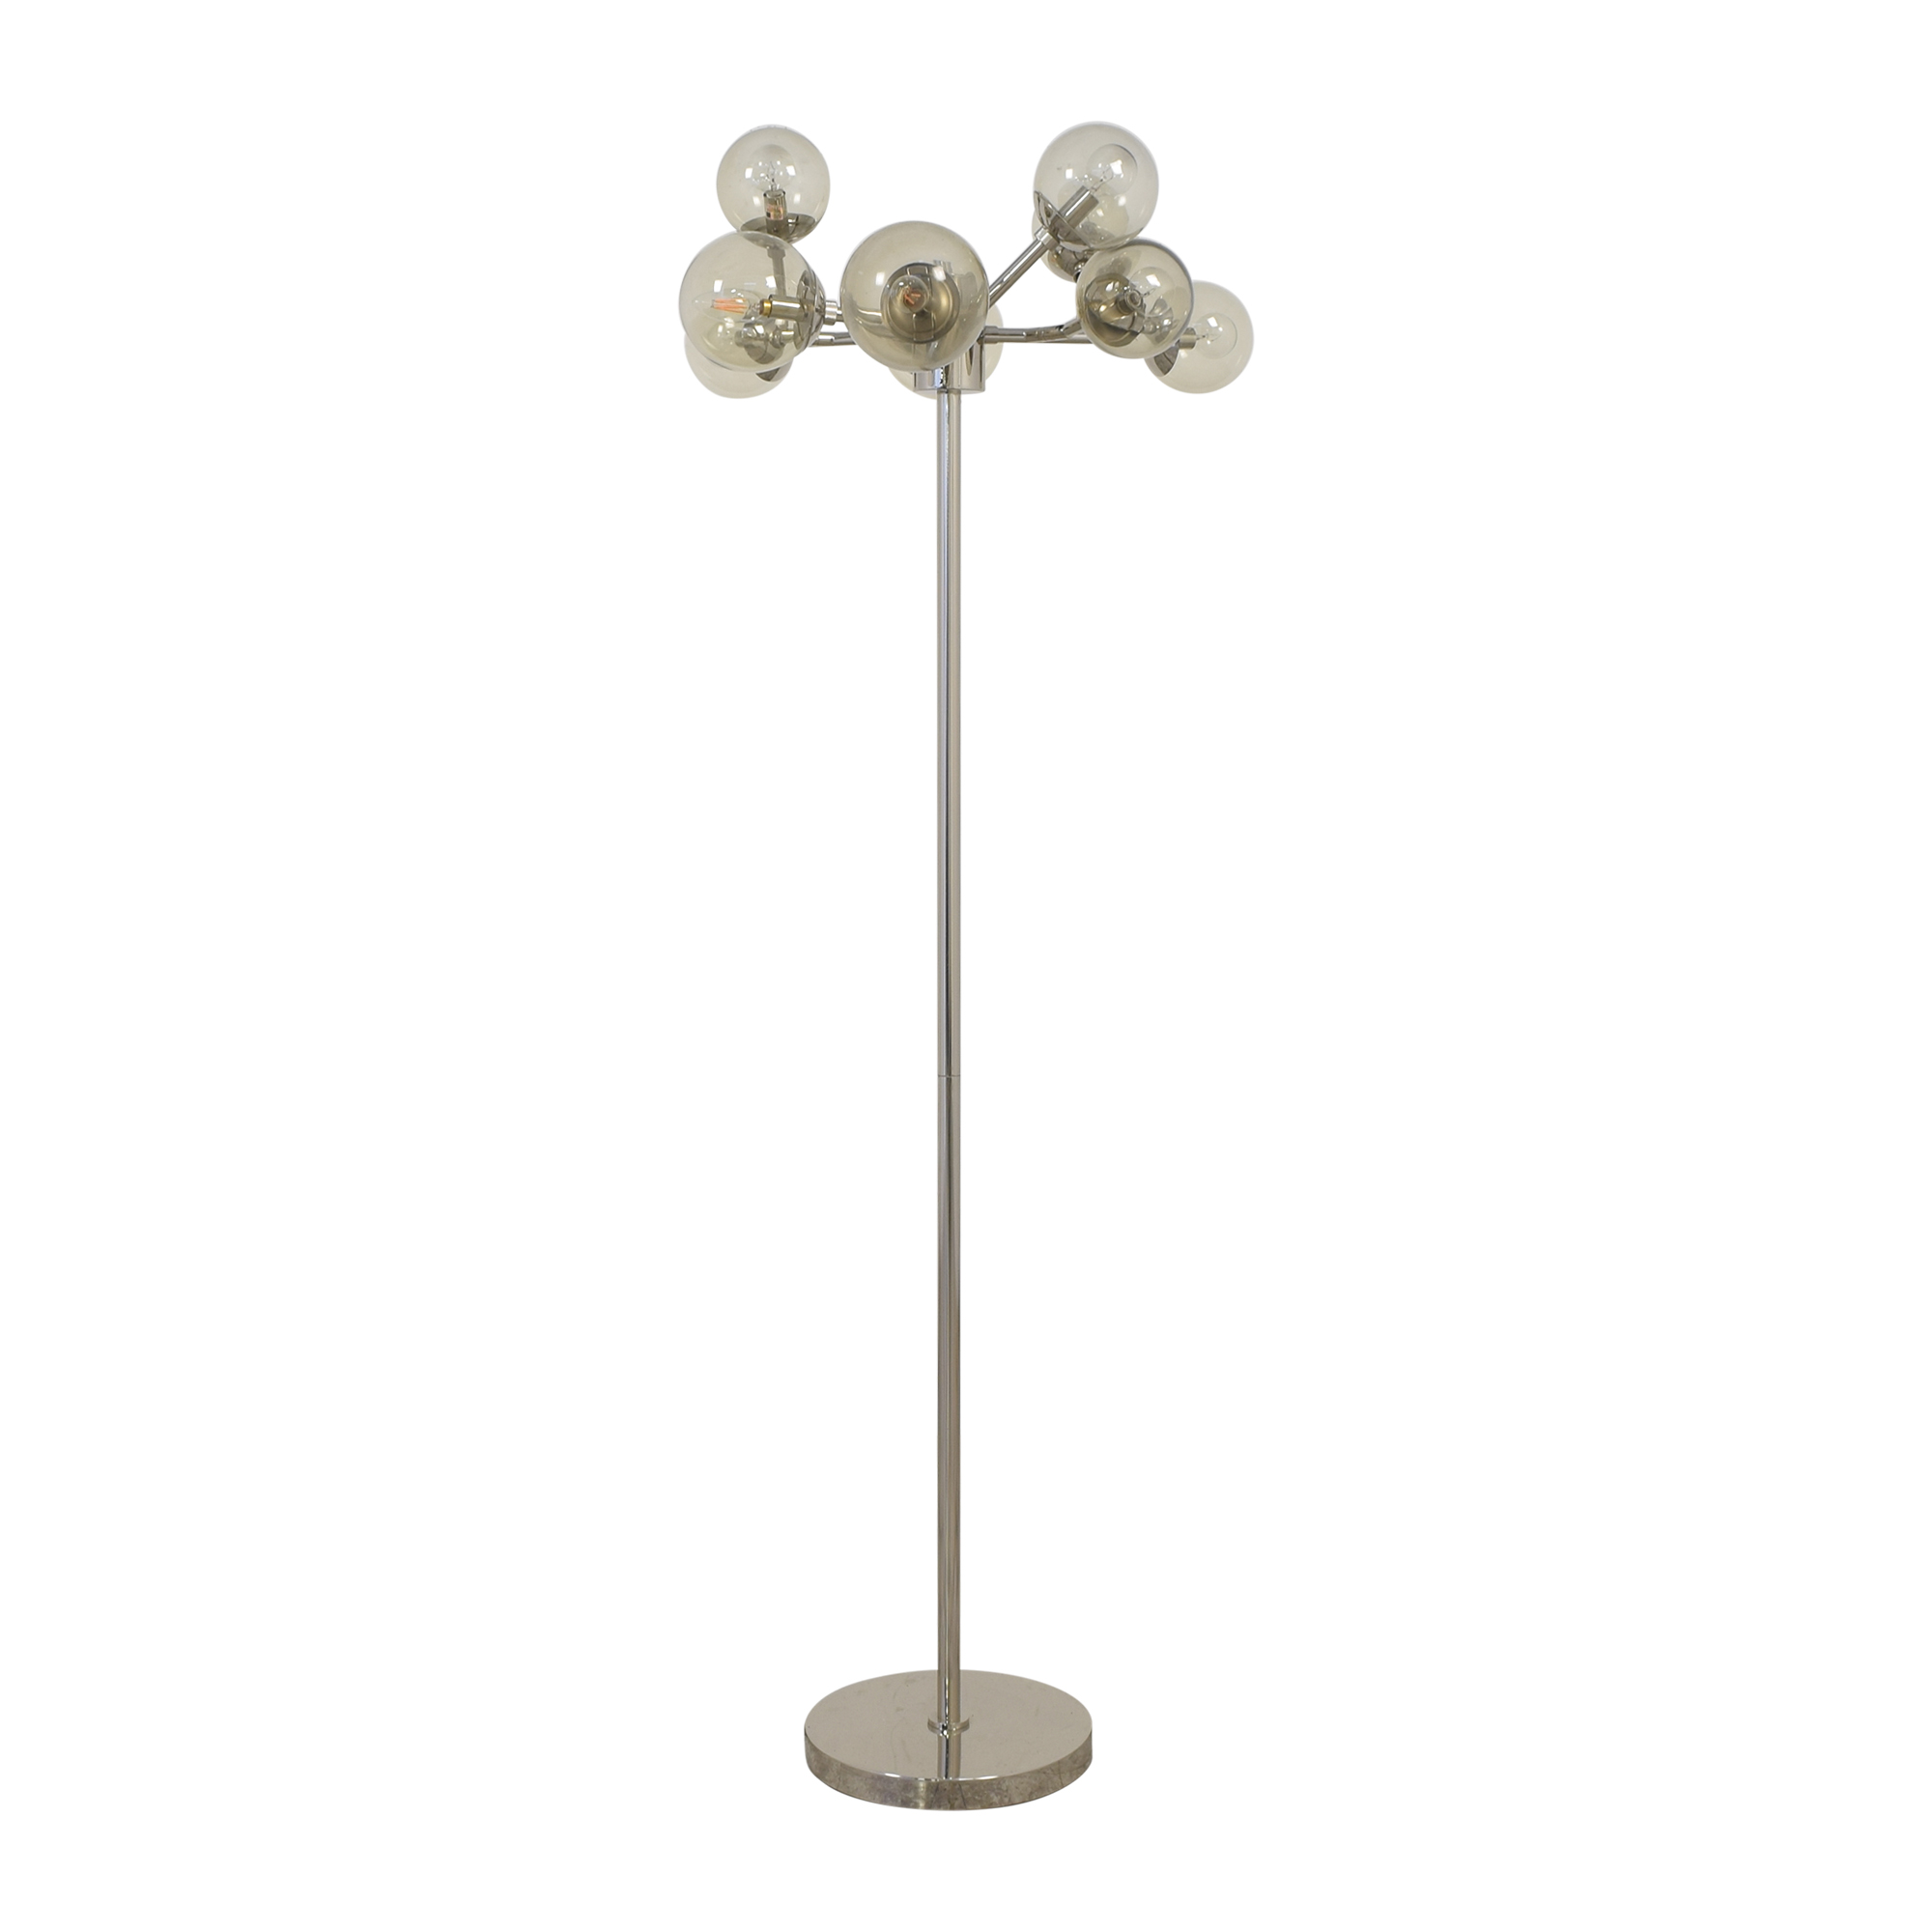 Mitchell Gold + Bob Williams Mitchell Gold + Bob Williams Savoy Floor Lamp Lamps